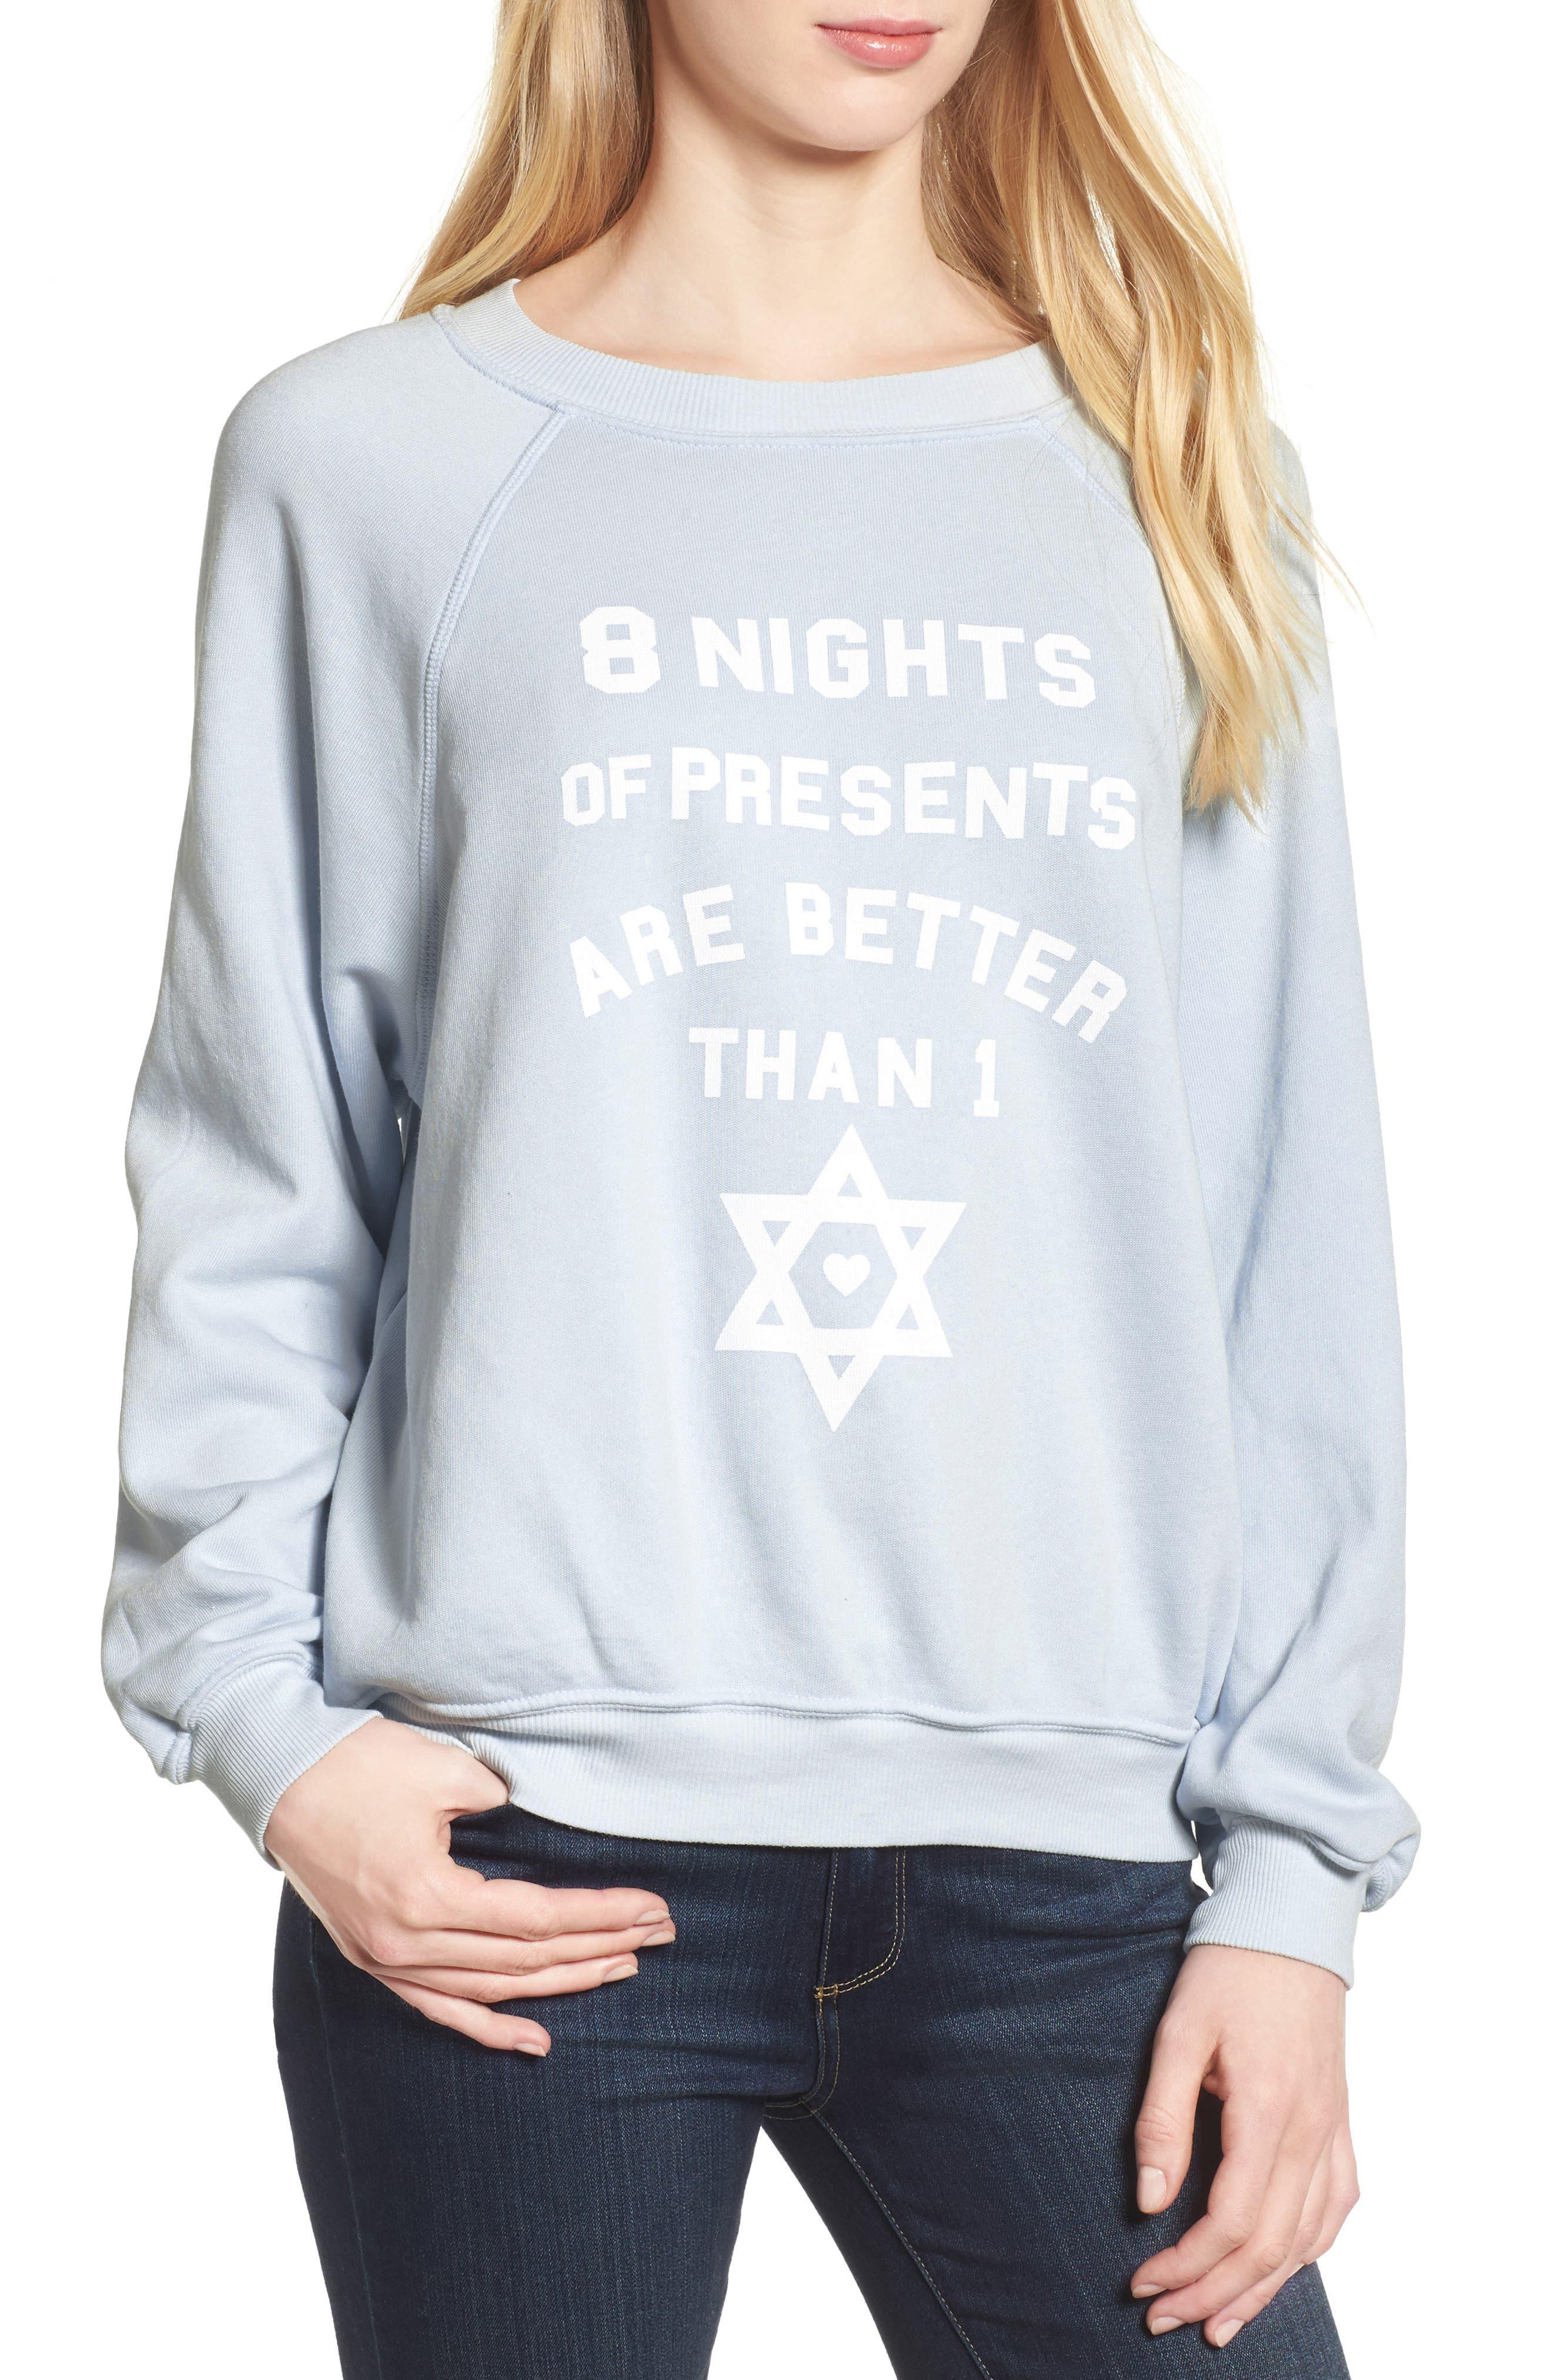 Eight Nights of Presents Hanukkah Sweater,                             Main thumbnail 1, color,                             401